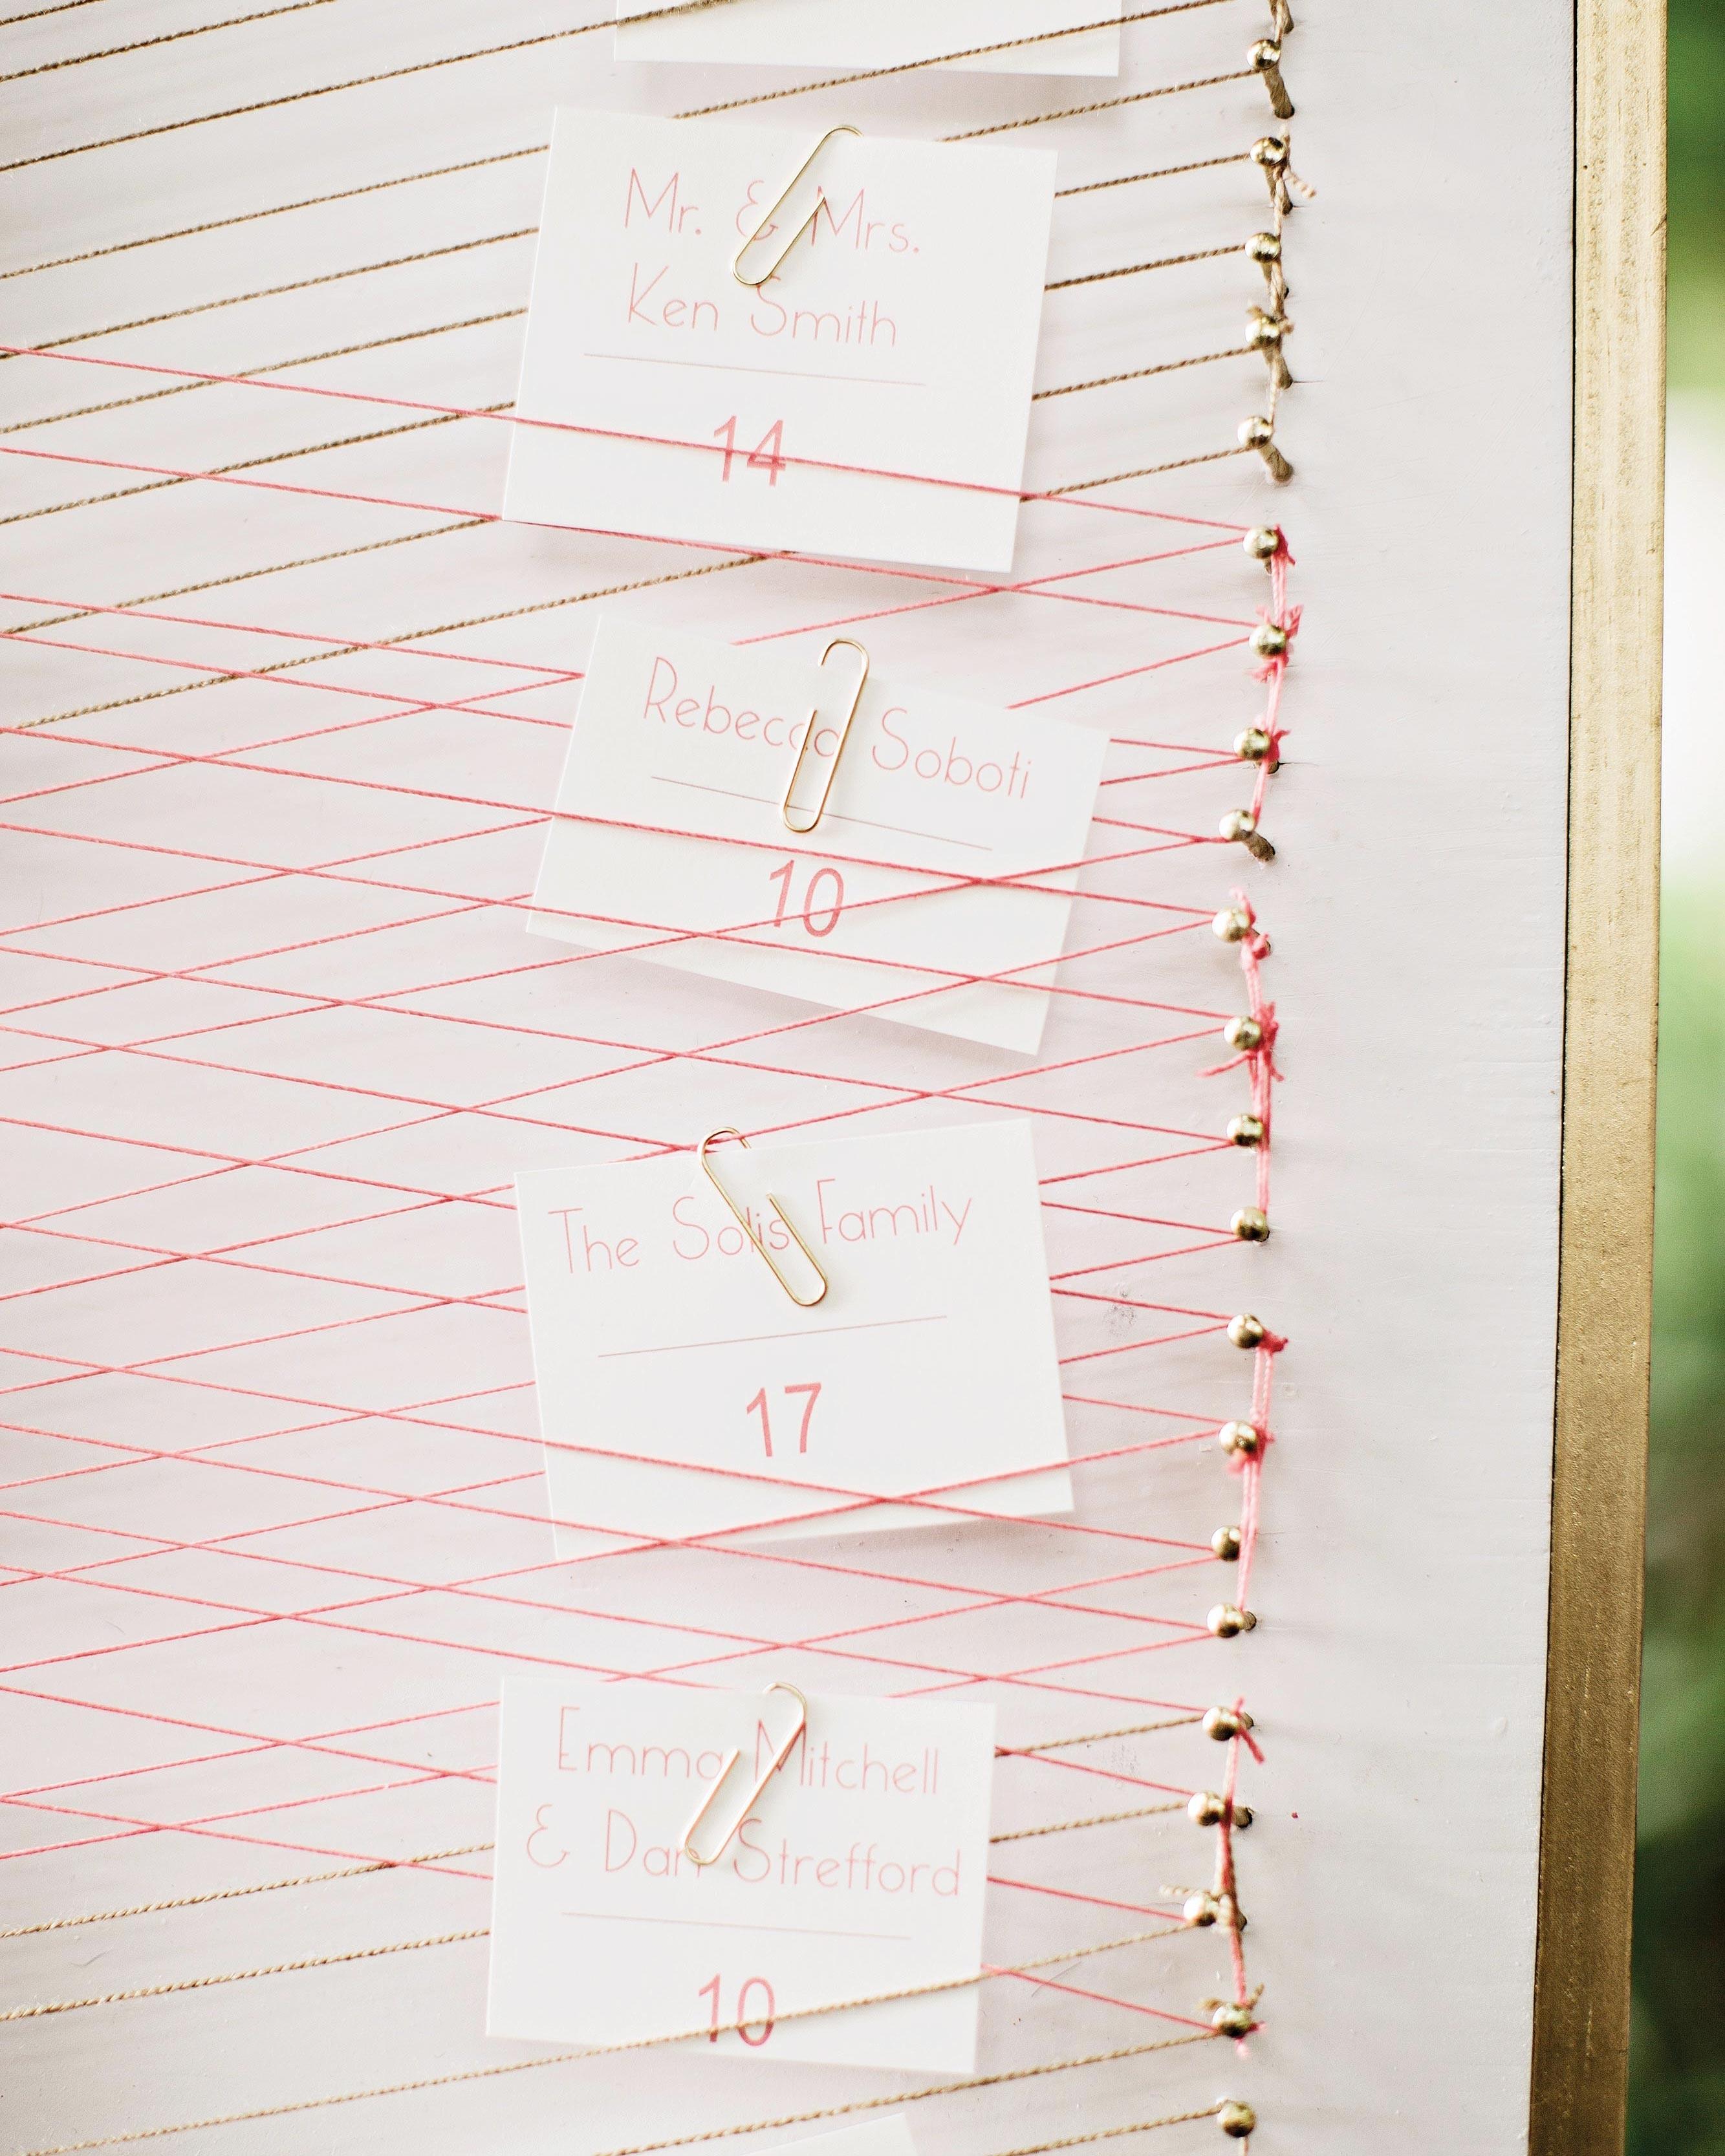 tara-dan-wedding-texas-place-cards-007-s112848.jpg